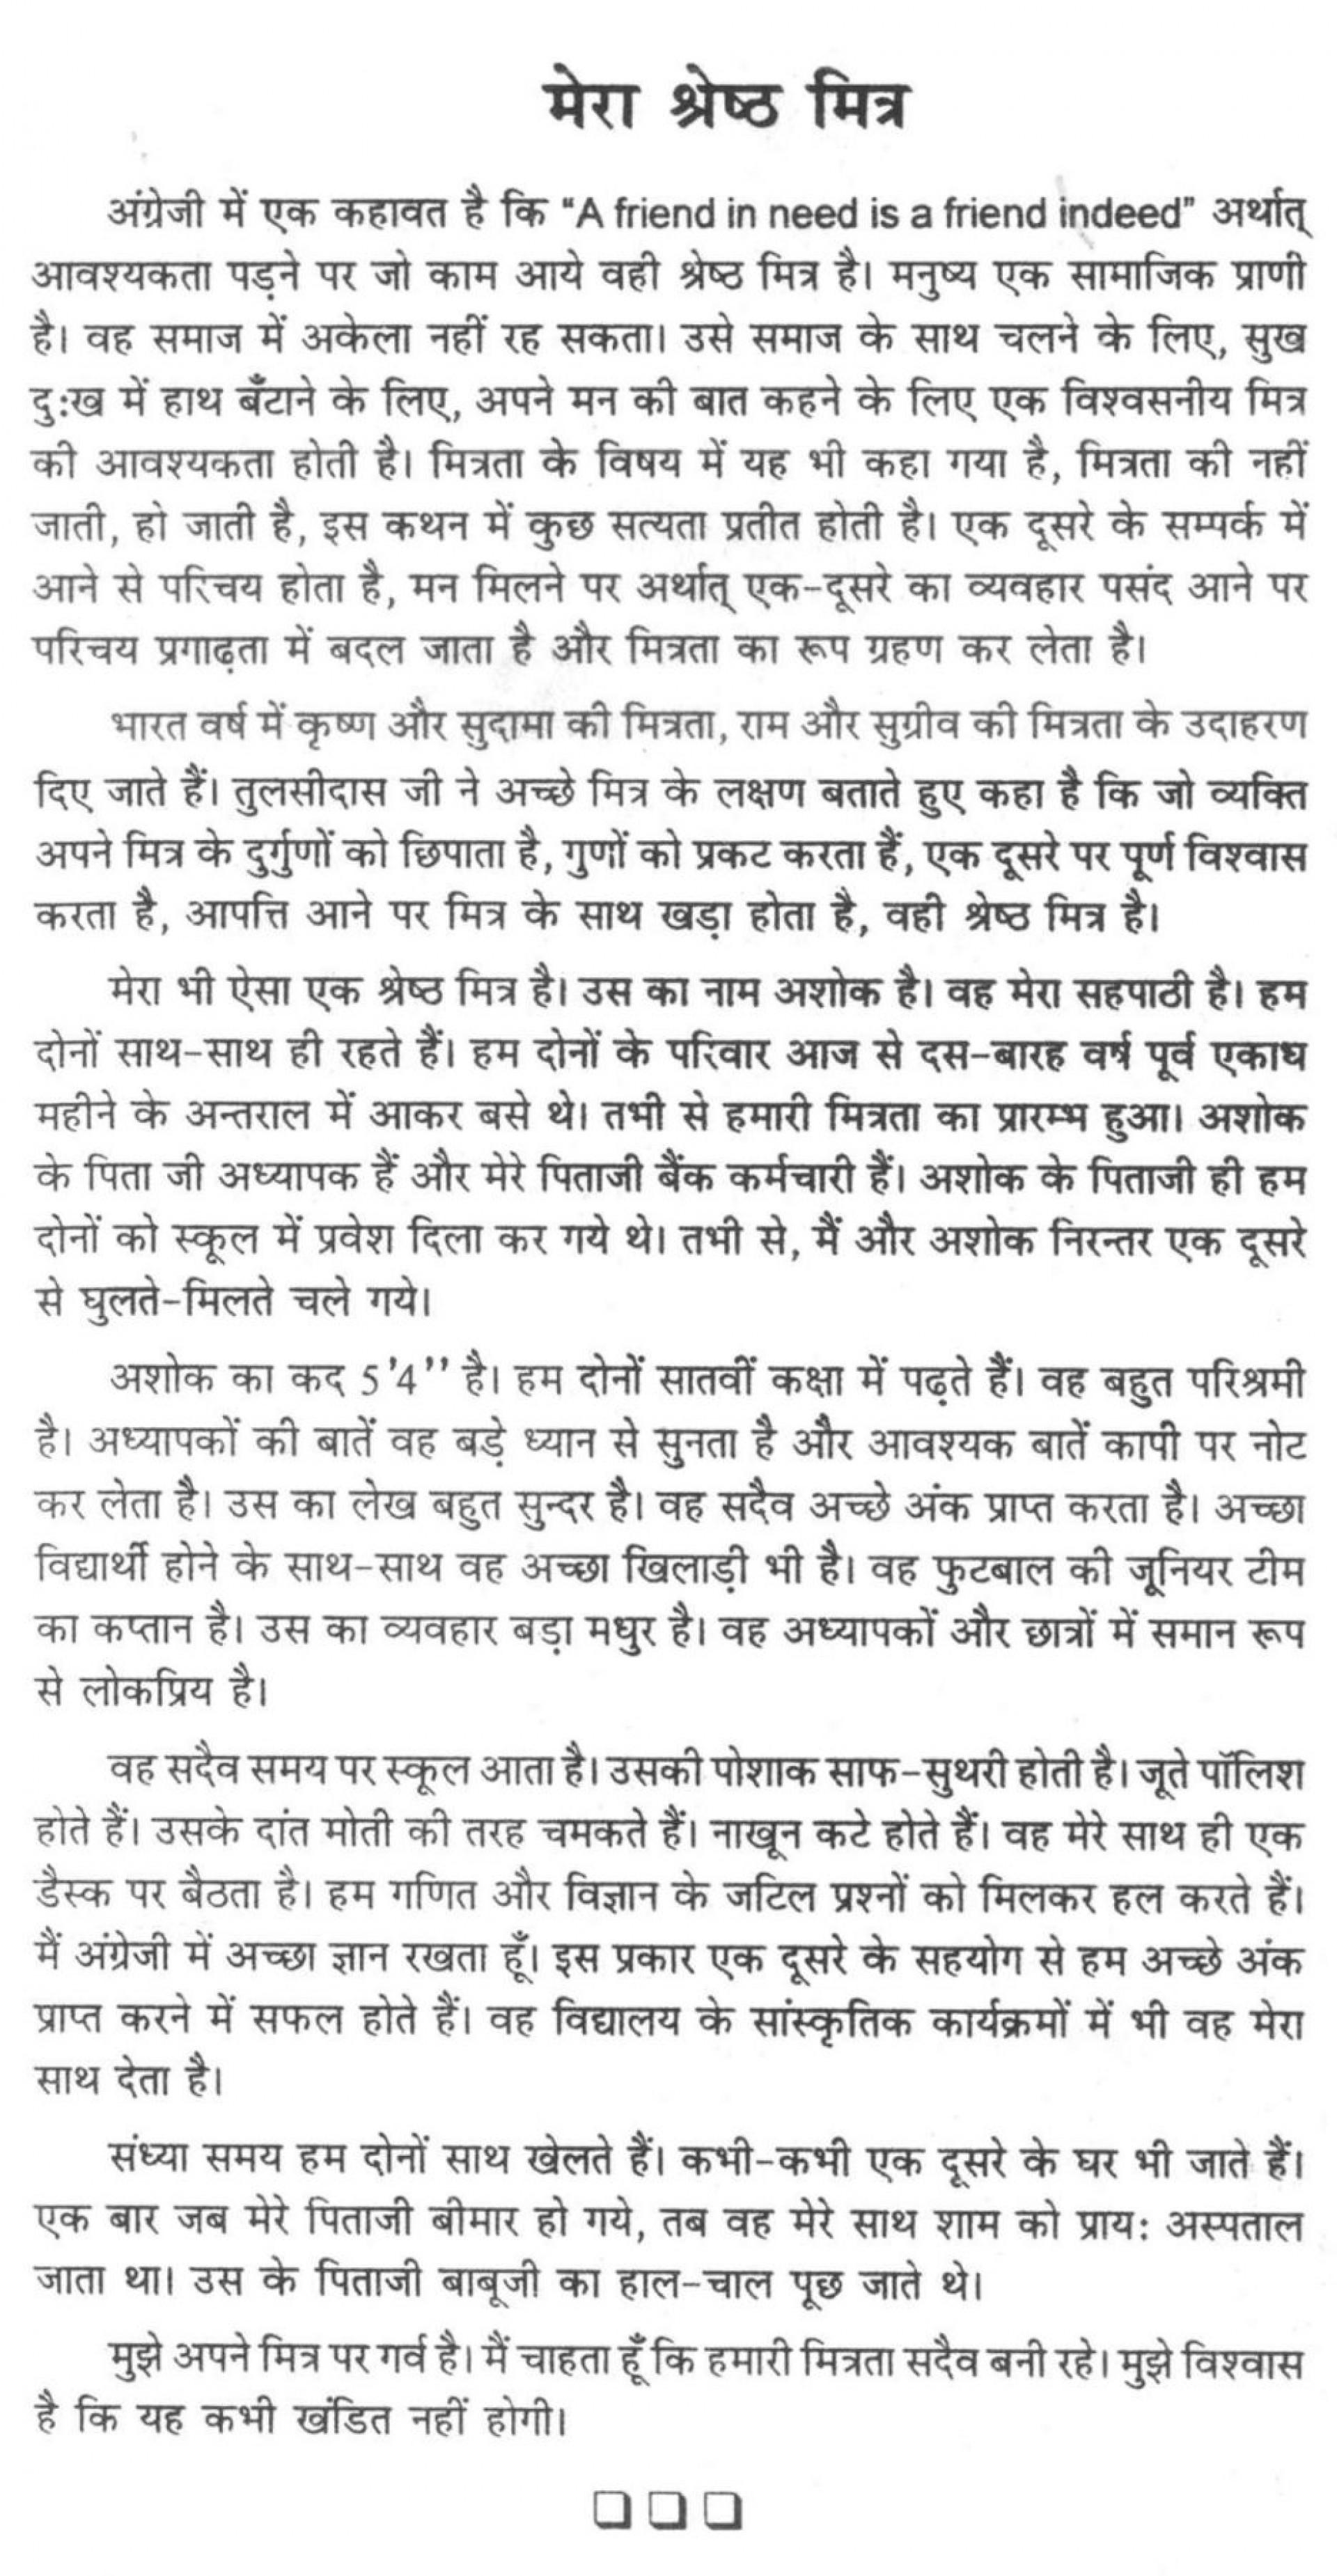 003 Essay Example Qualities Of Good Friends Friend Thumb Teacher Great Characteristics Pdf In Hindi Three Free Language Urdu Amazing A My Best Should Have 1920